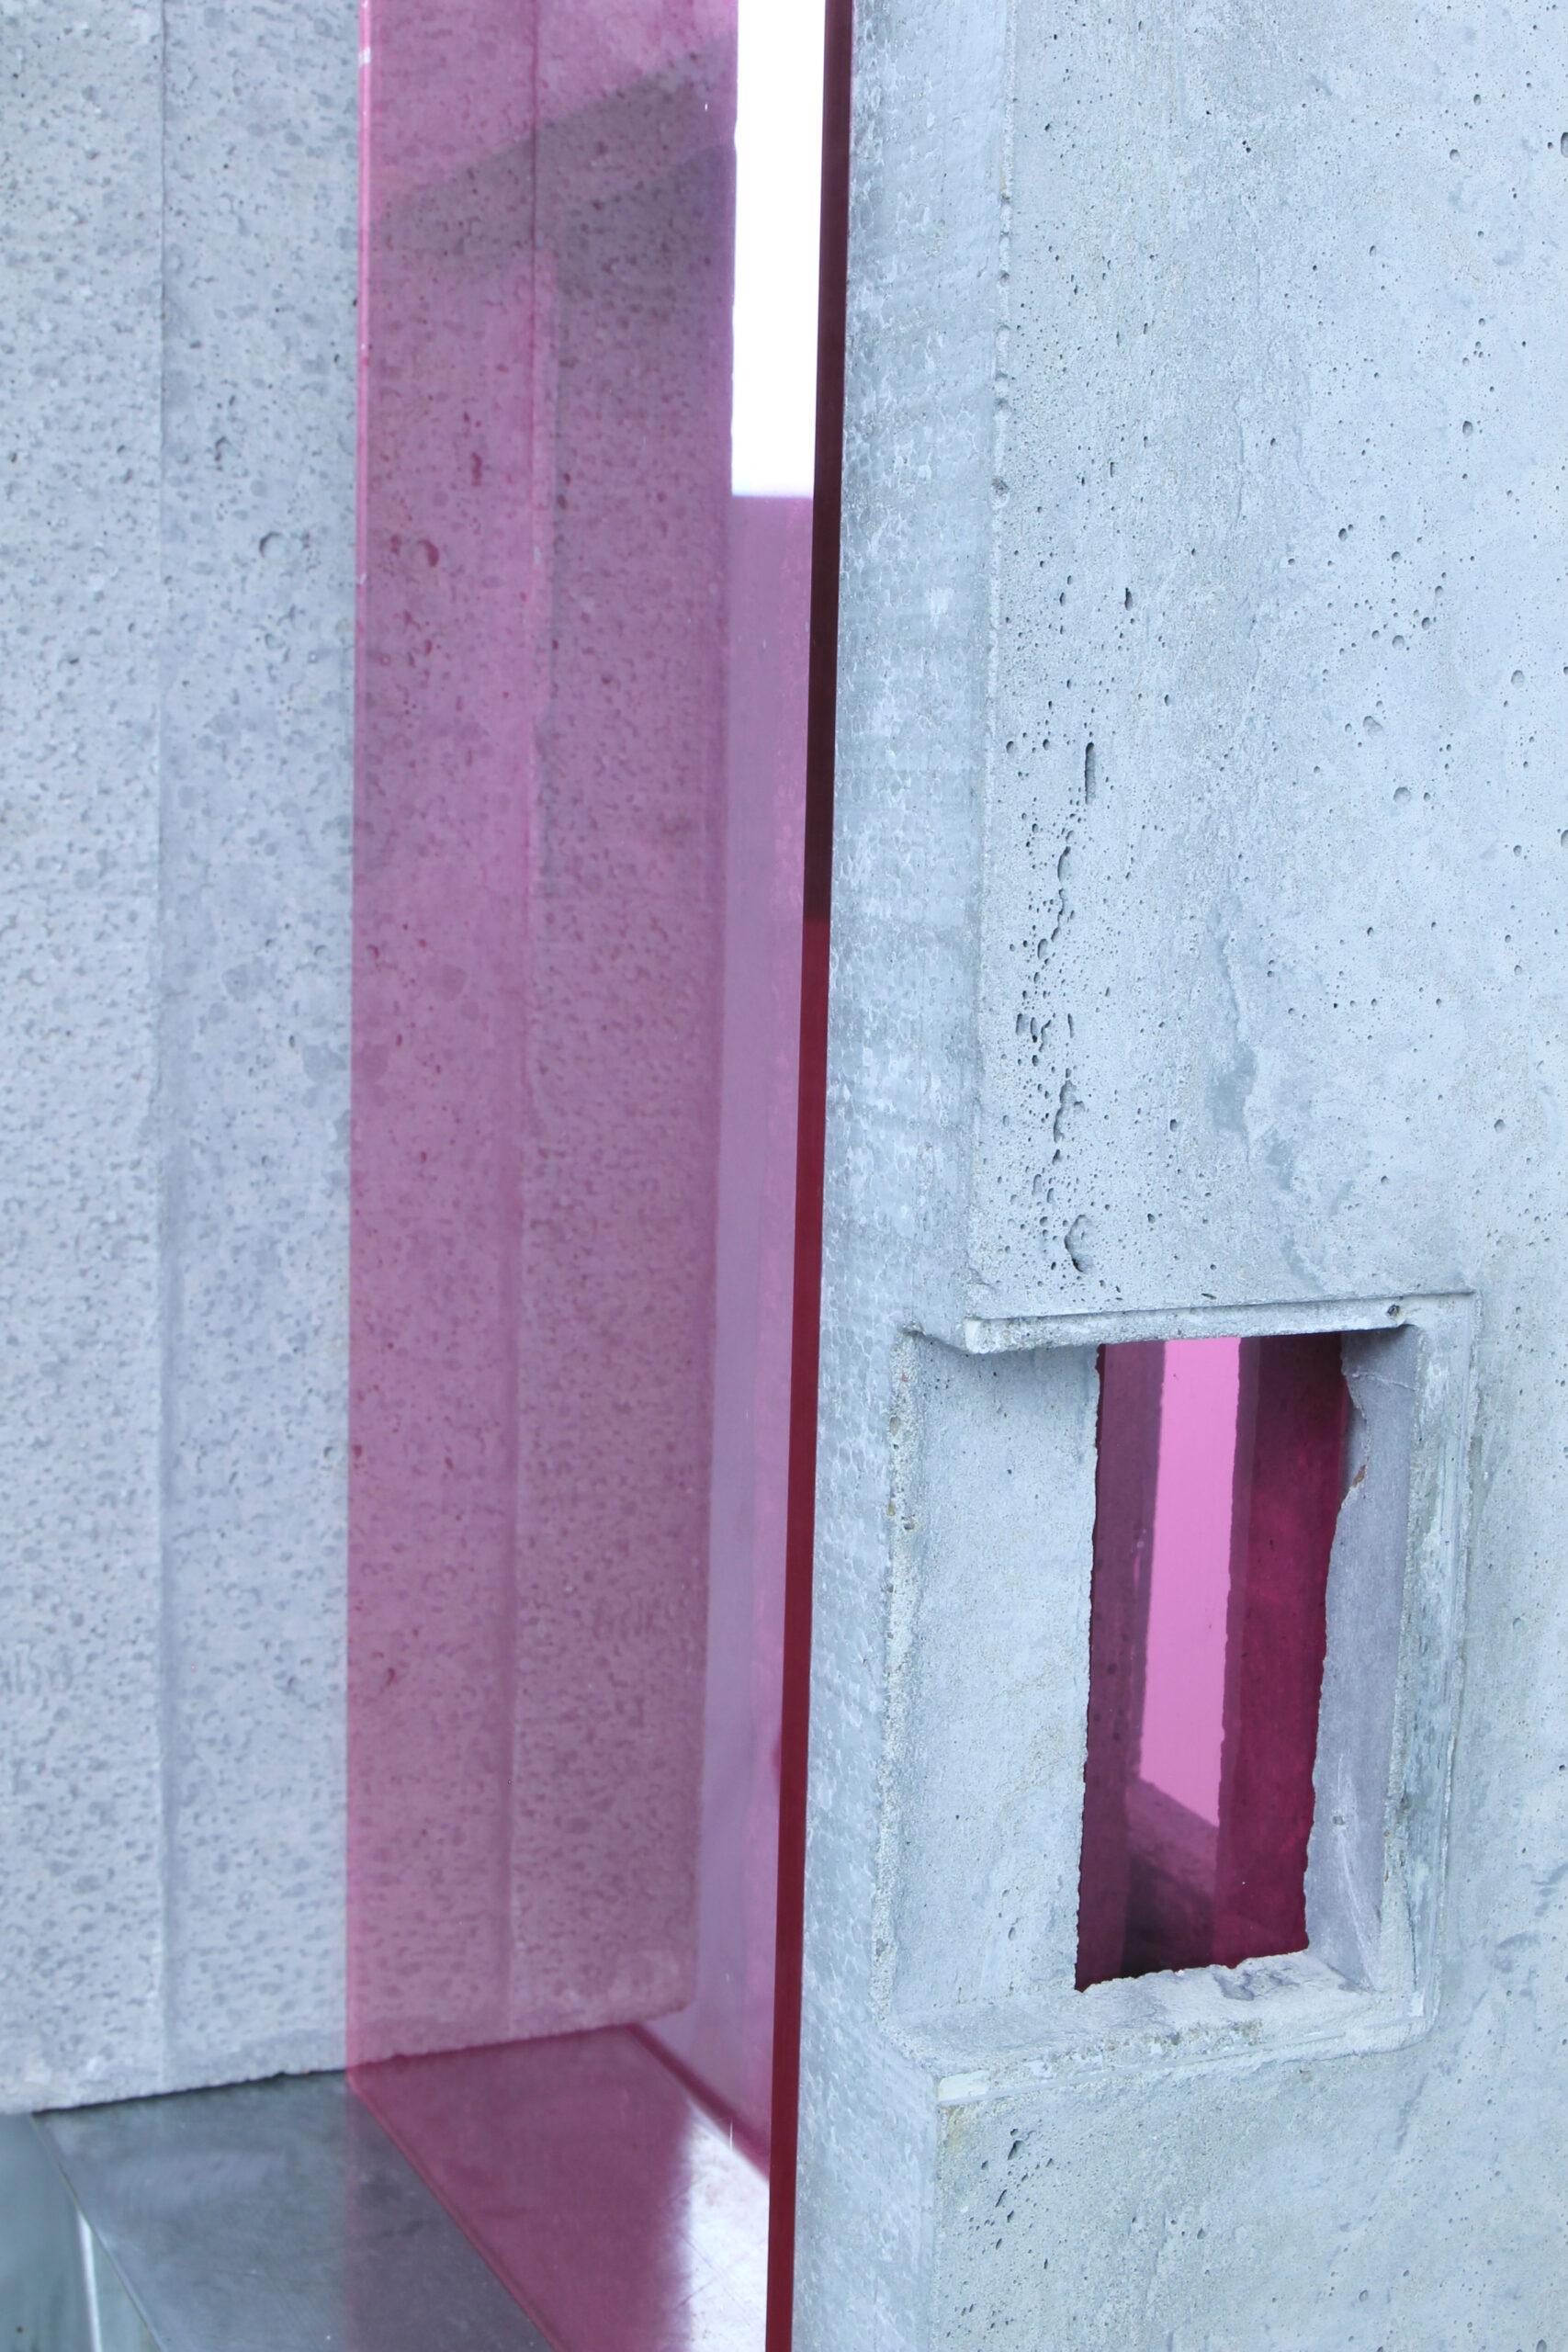 translucide  III | 2020 | Beton, Acrylglas , Metall | 29 x 45 x 150 cm